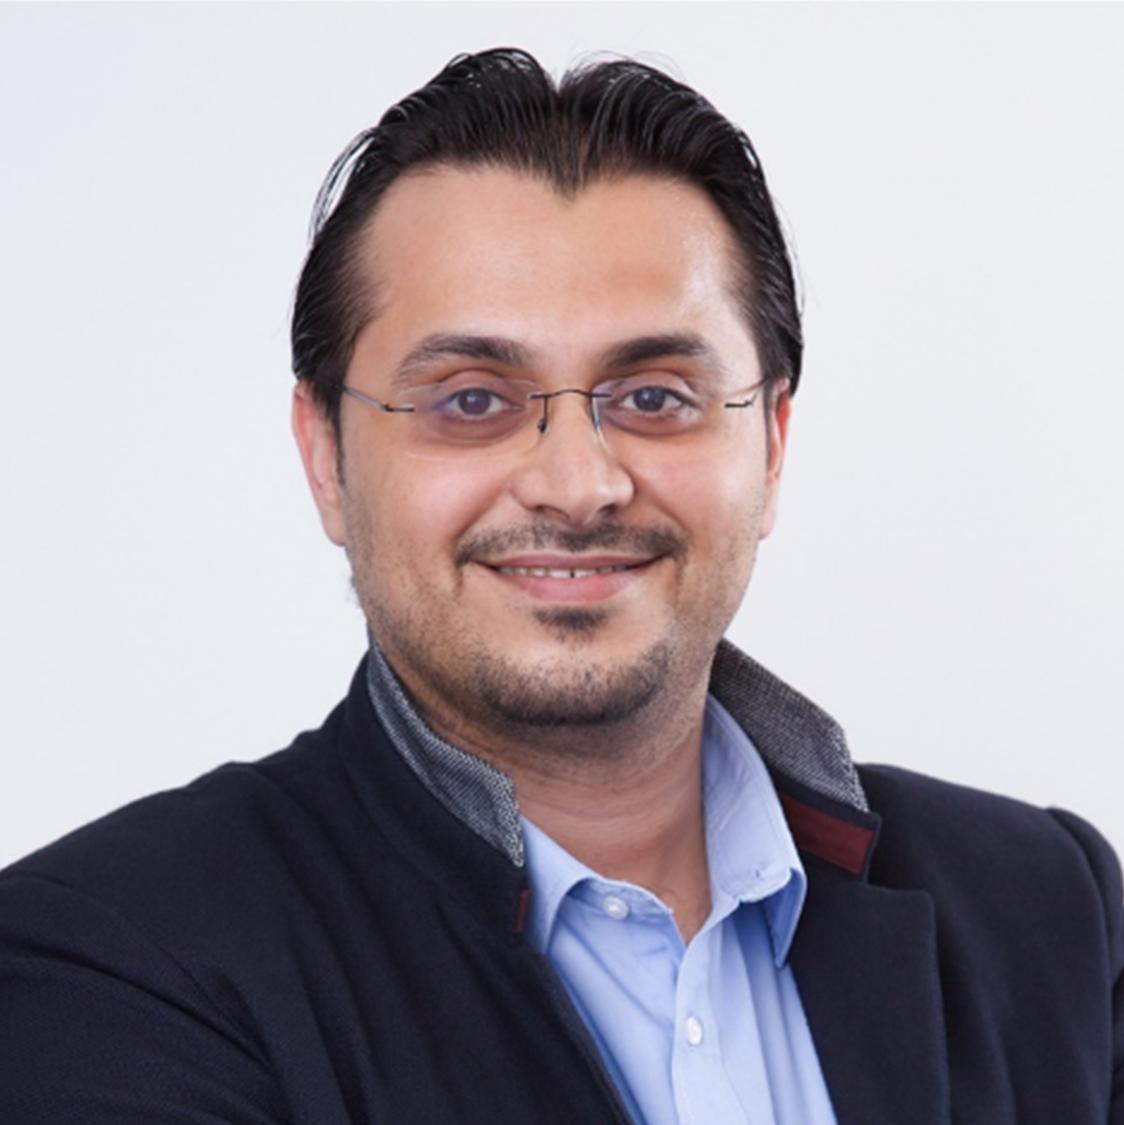 Mohammed Sheik Ali